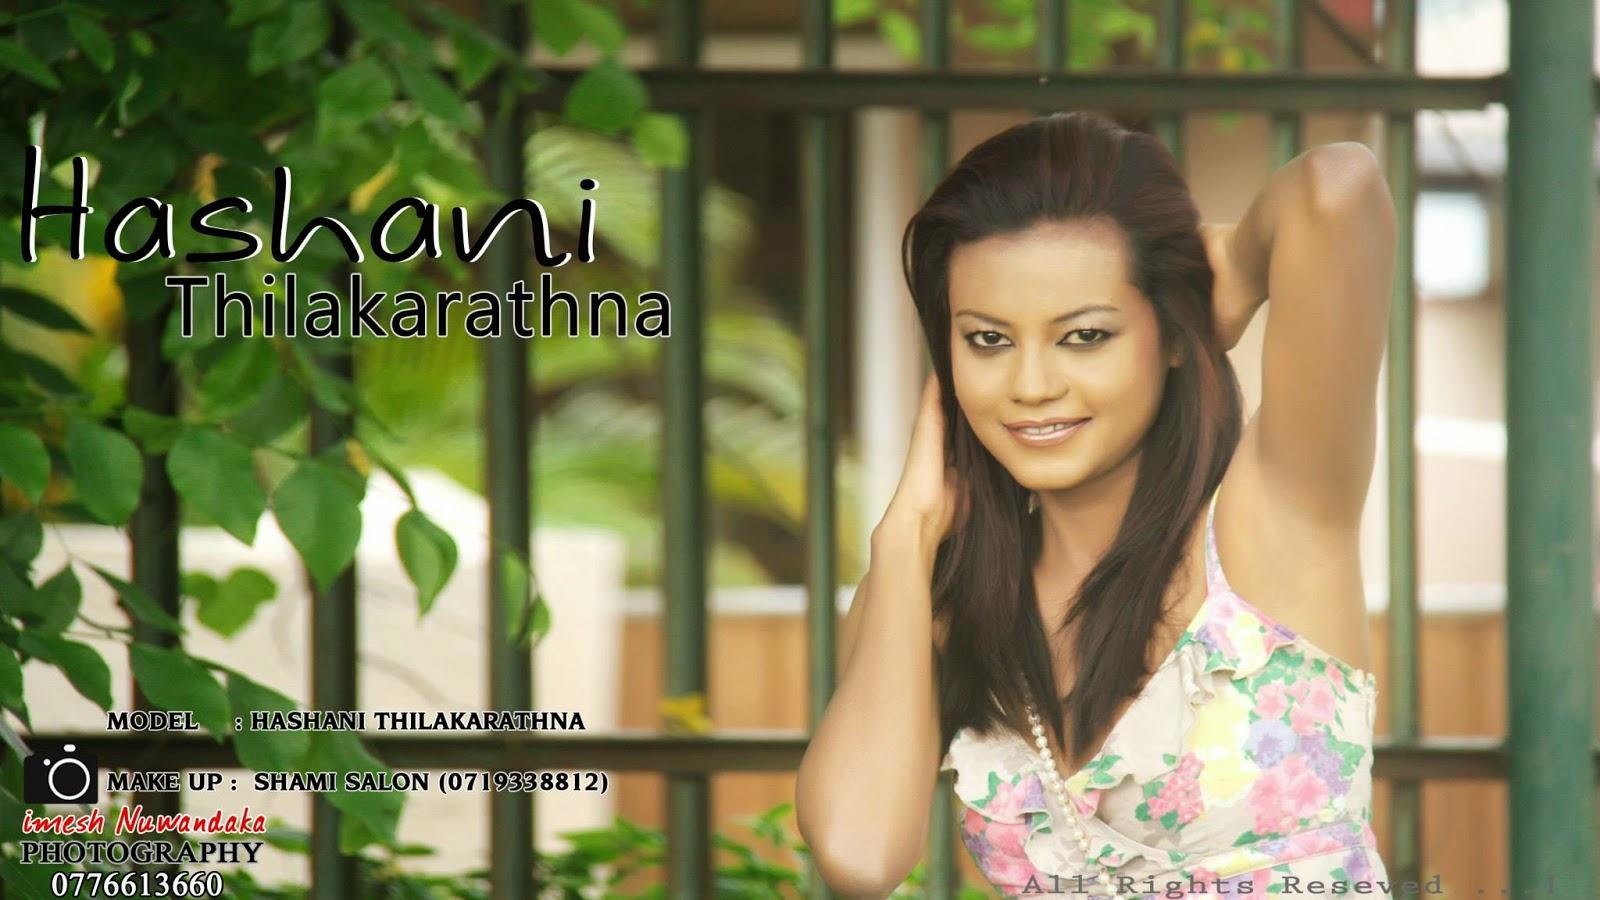 Hashani Thilakarathna armpit